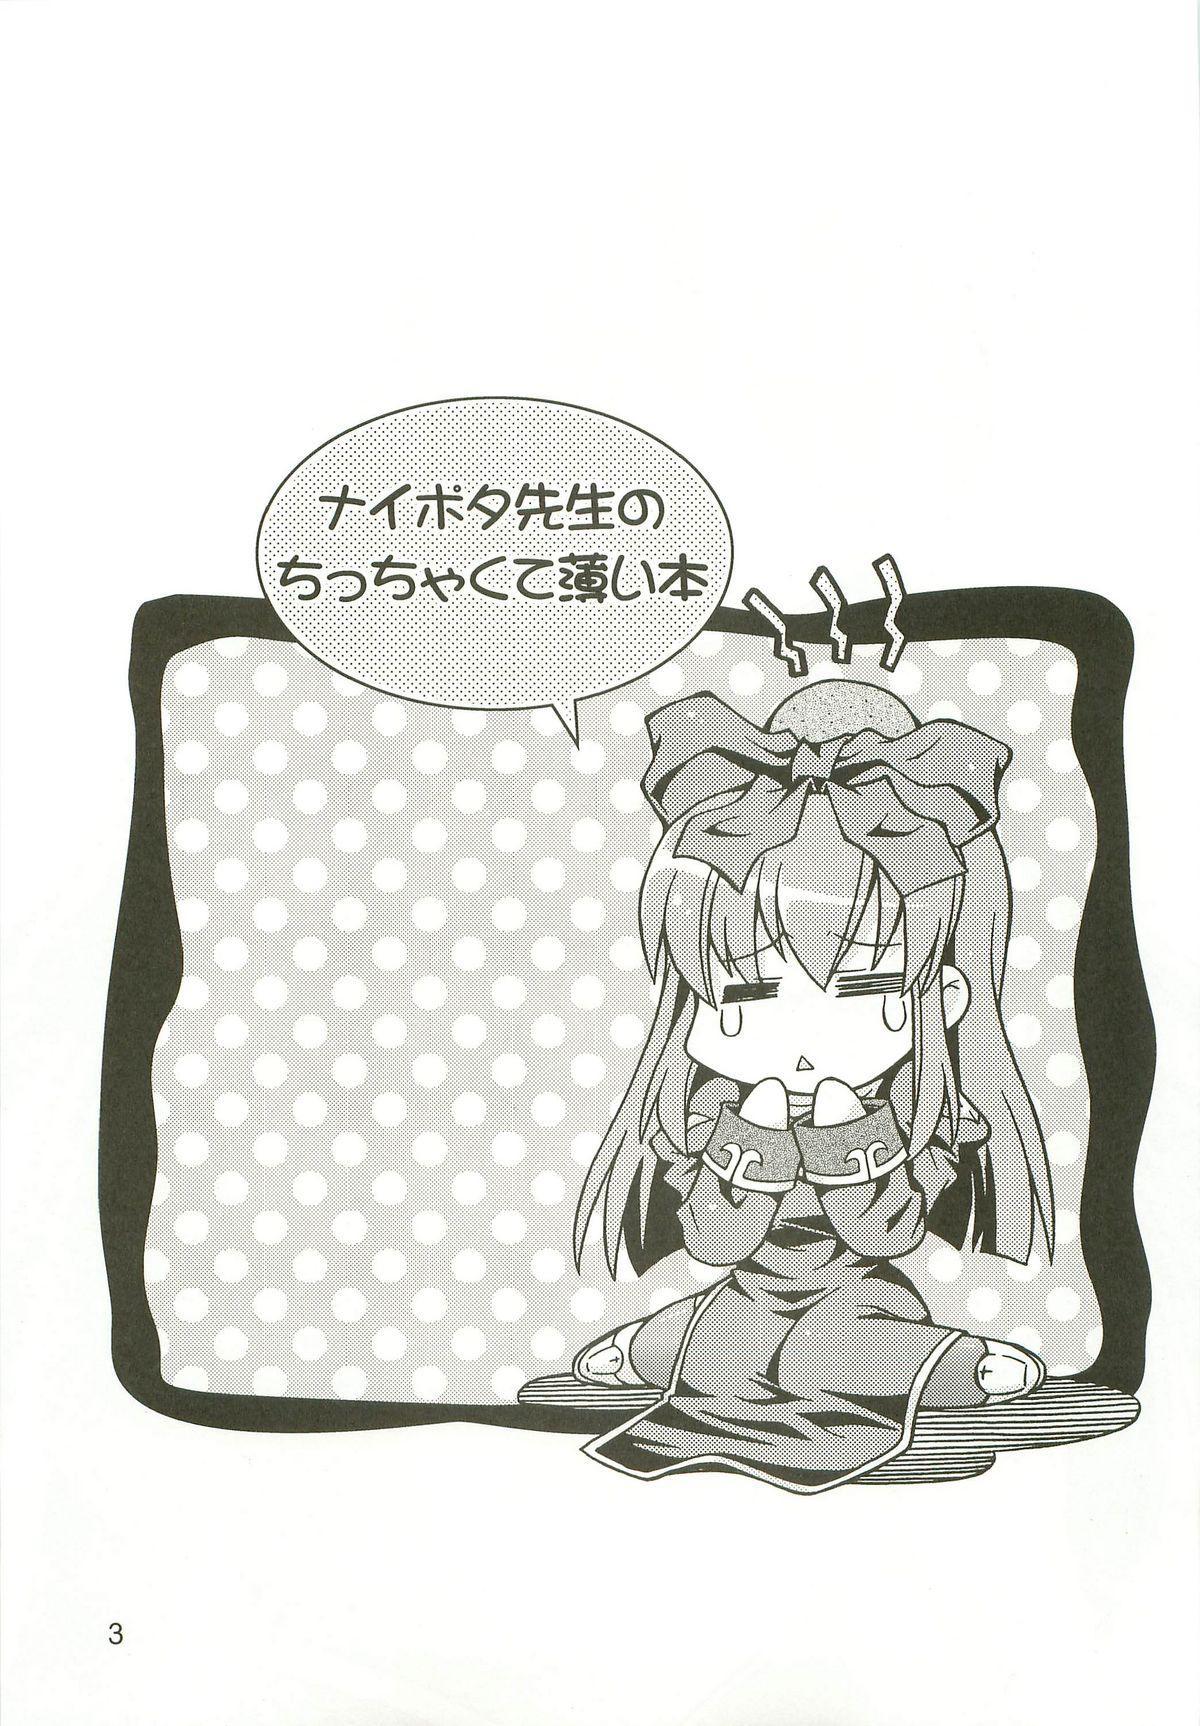 [Atelier Muse] toppatsu RO-bon naipota-sensei no chitcha kuteusui hon 1